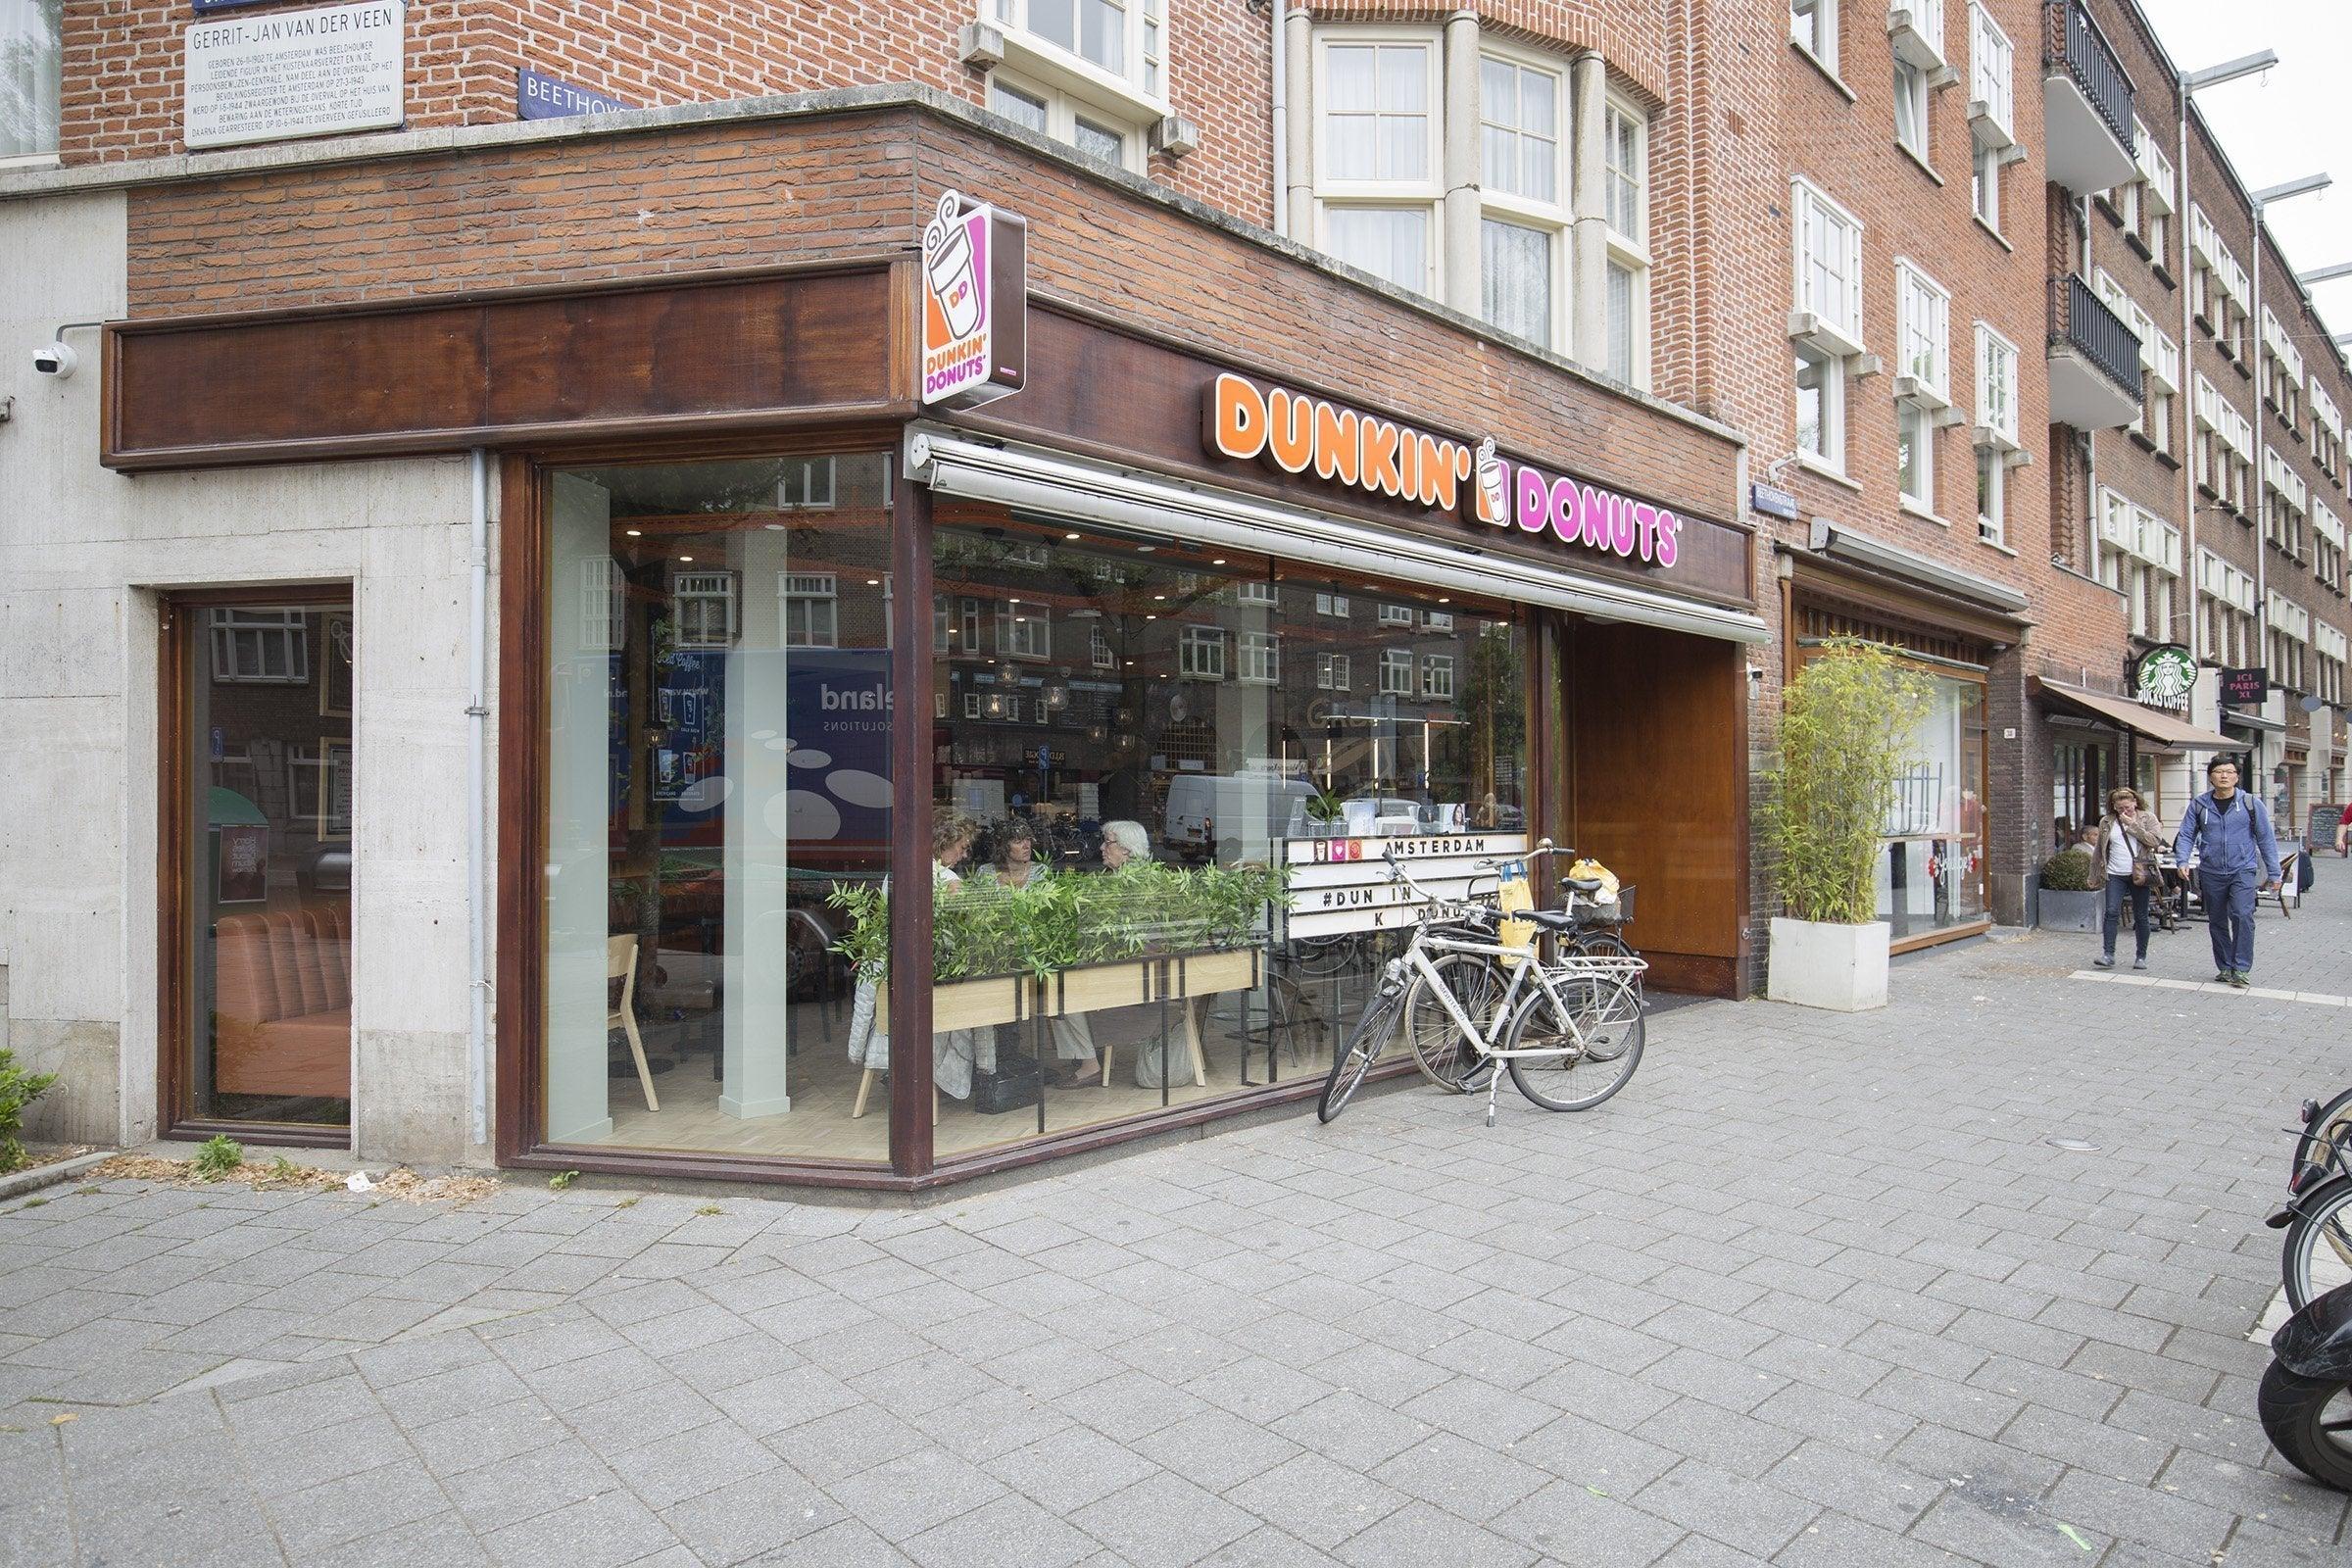 https://public.parariusoffice.nl/15/photos/huge/2262.1500040619-12.jpg